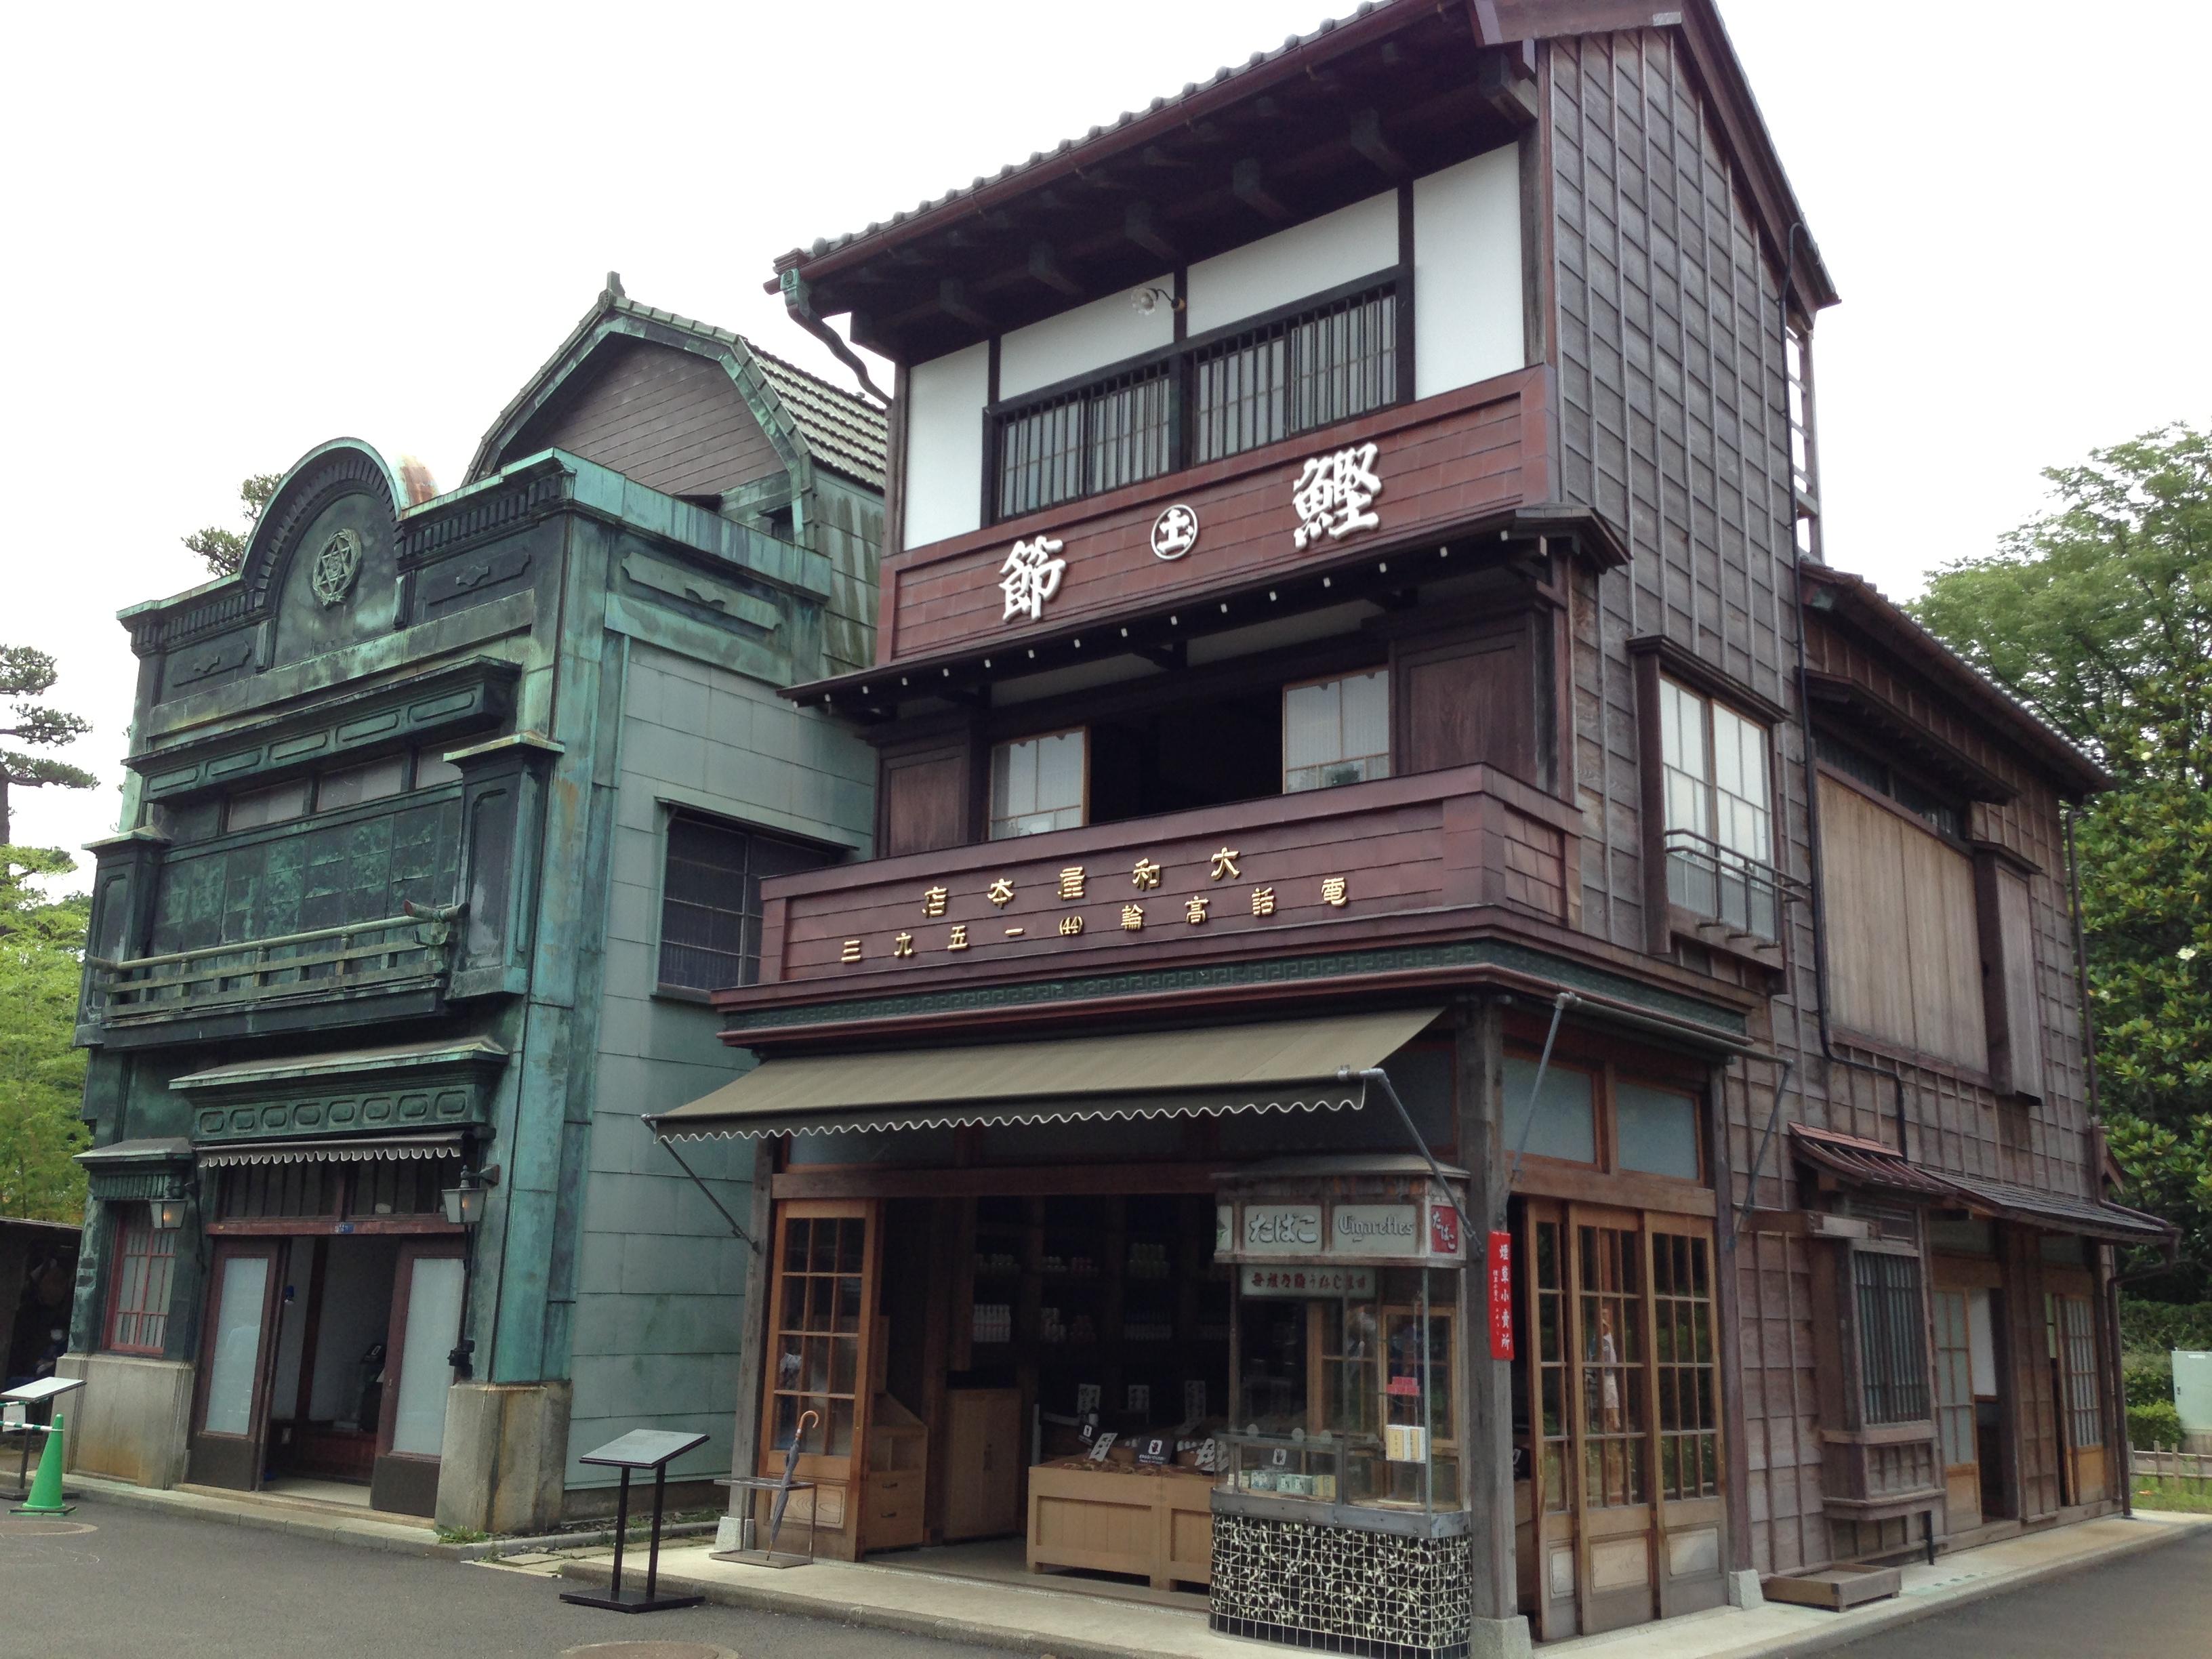 Exhibition Edo Tokyo Open Air Architectural Museum A